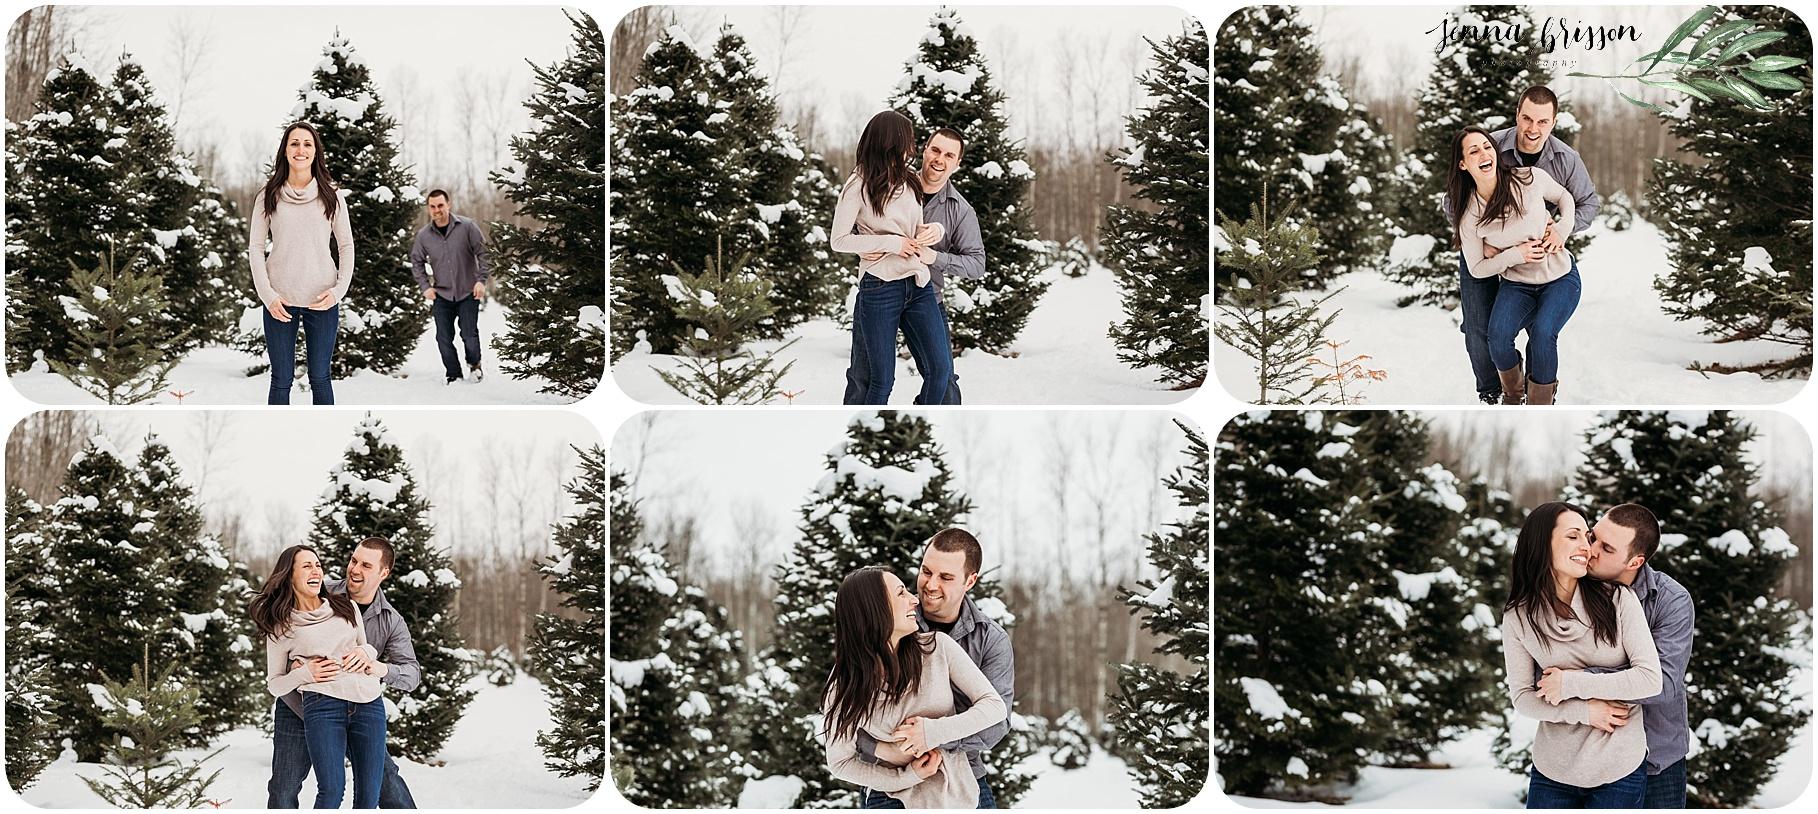 Vermont Winter Engagement Photos Candid